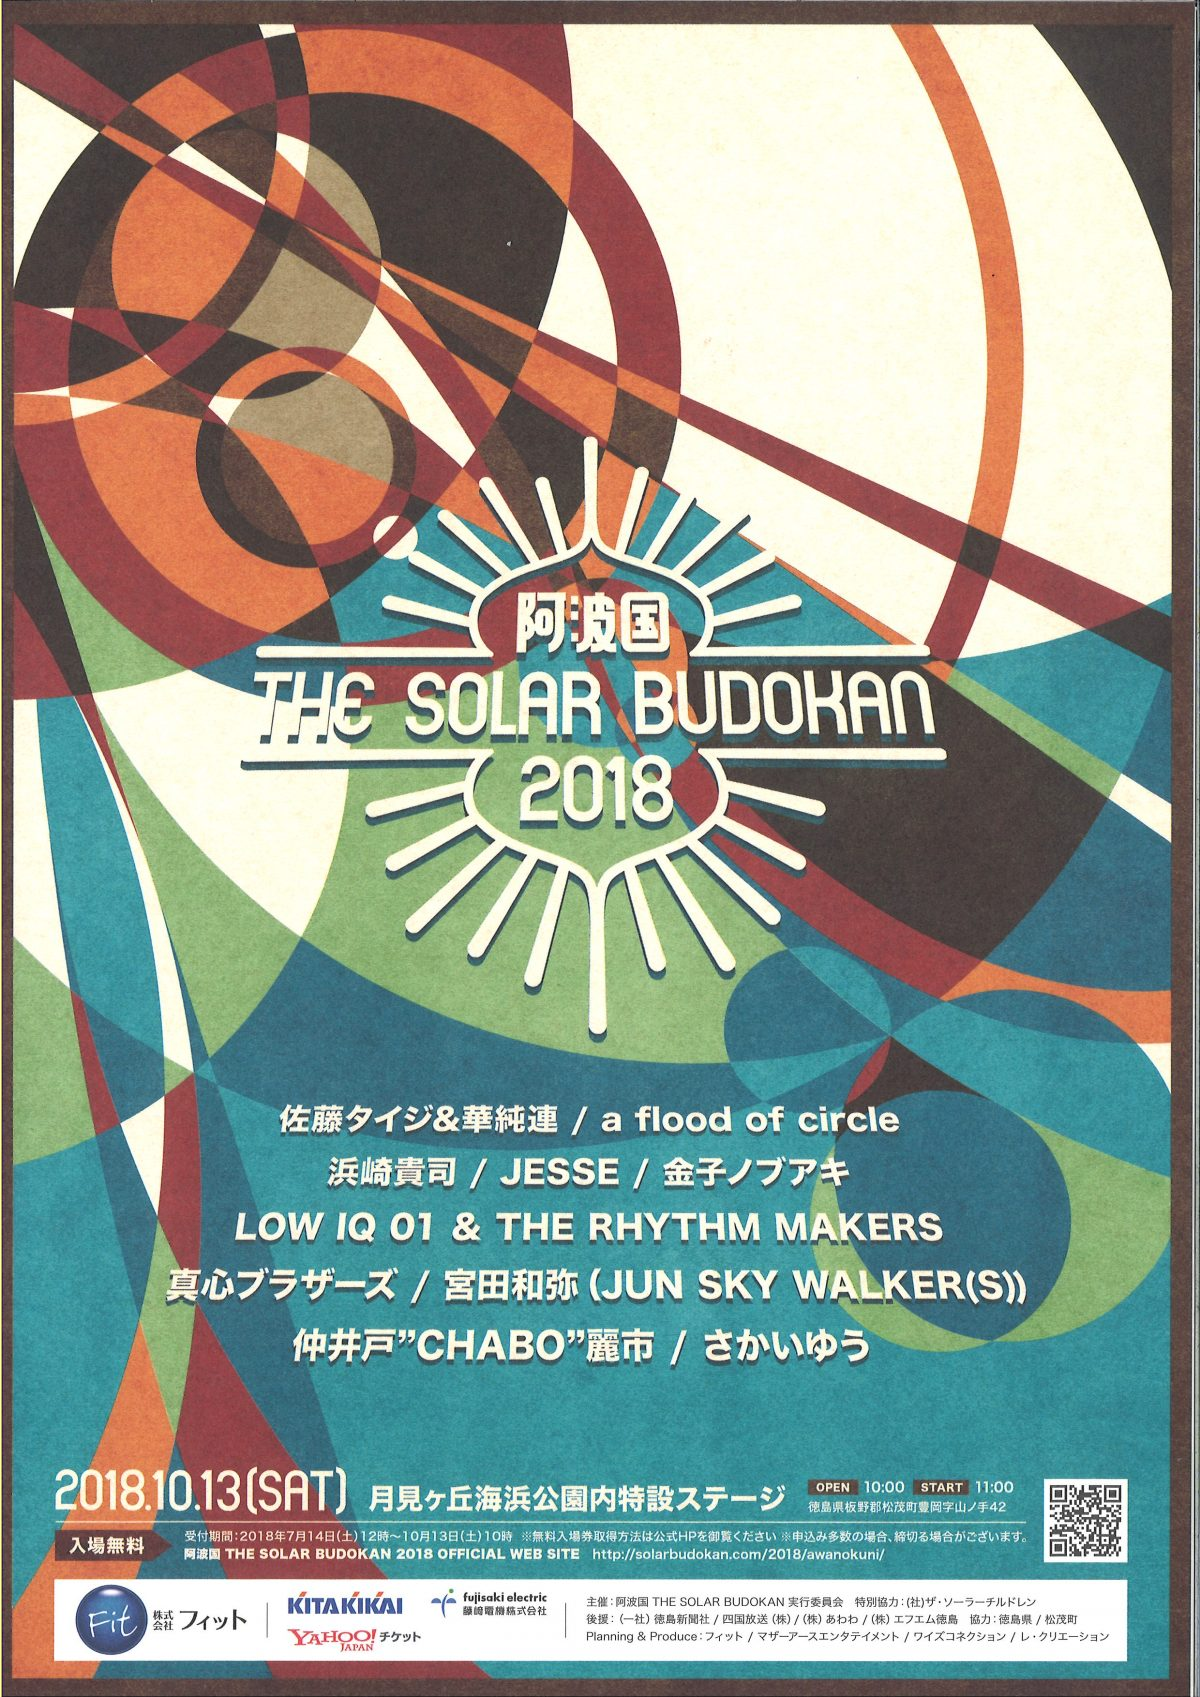 KITAKIKAI は THE SOLAR BUDOKAN を応援しています!